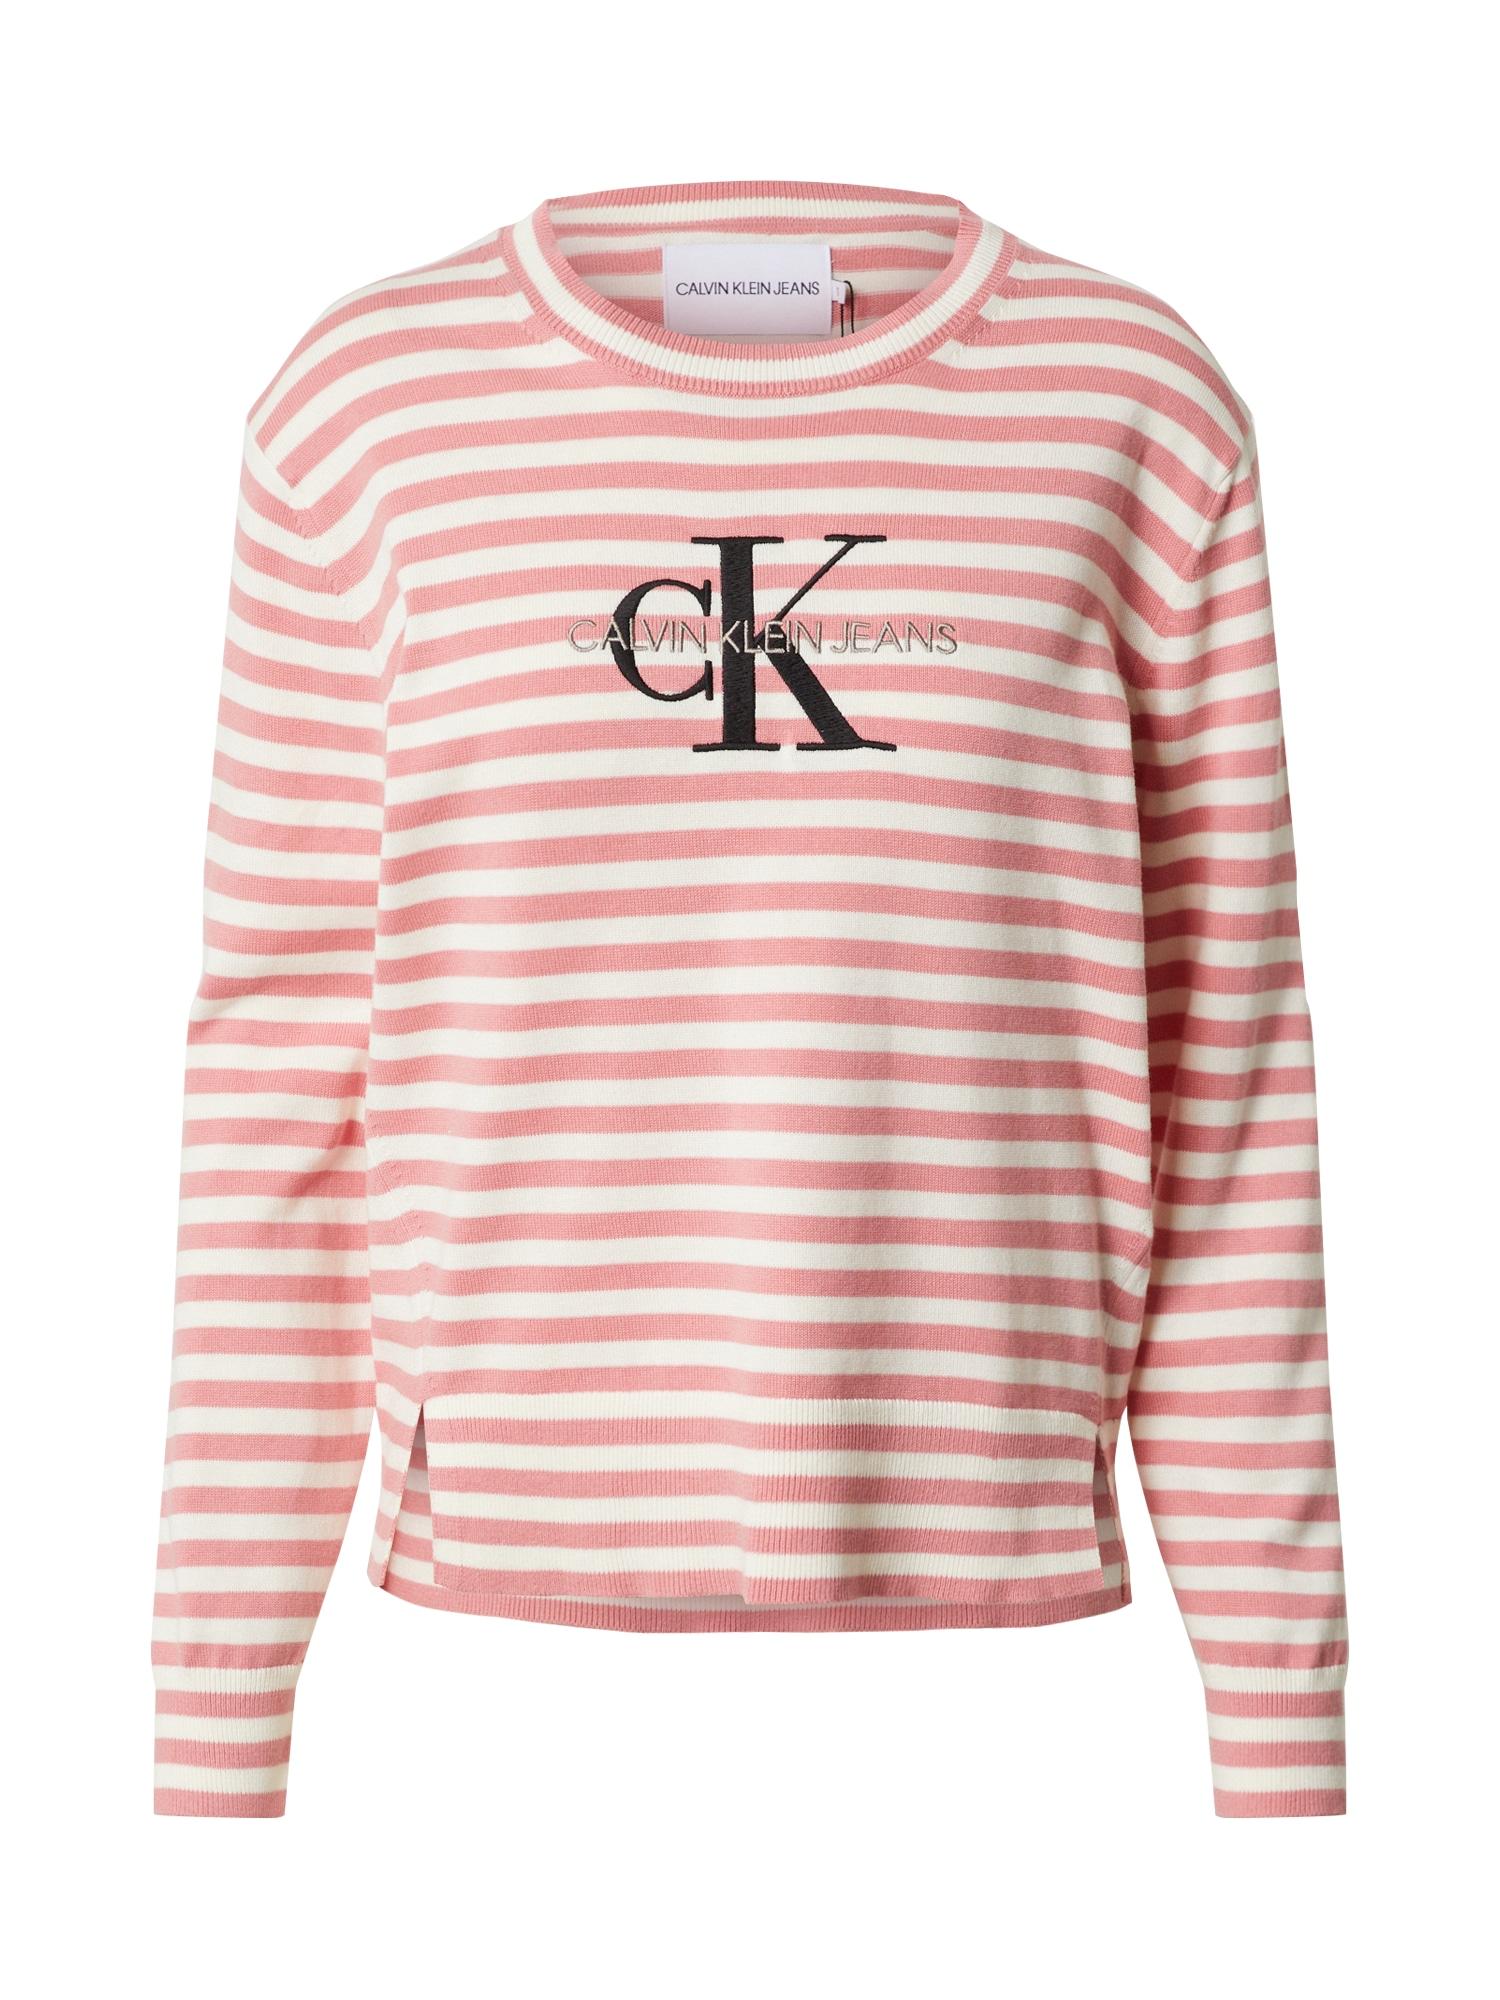 Calvin Klein Jeans Megztinis šviesiai raudona / balta